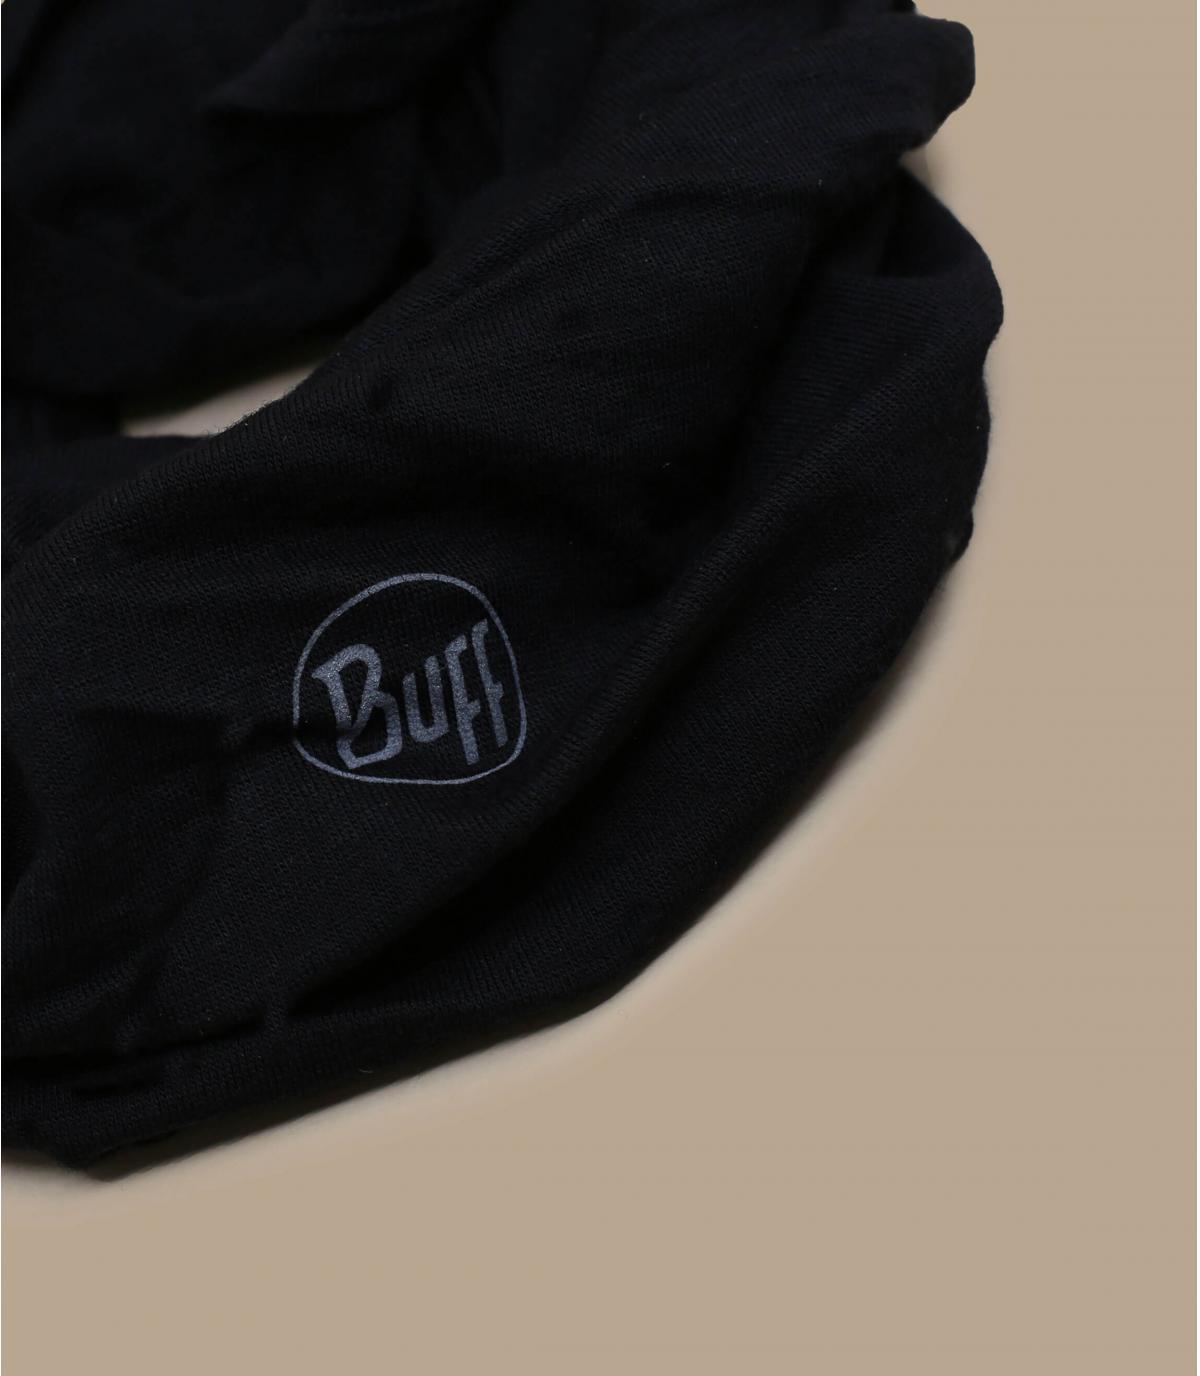 Details Midweight Merino Wool Solid black - Abbildung 2